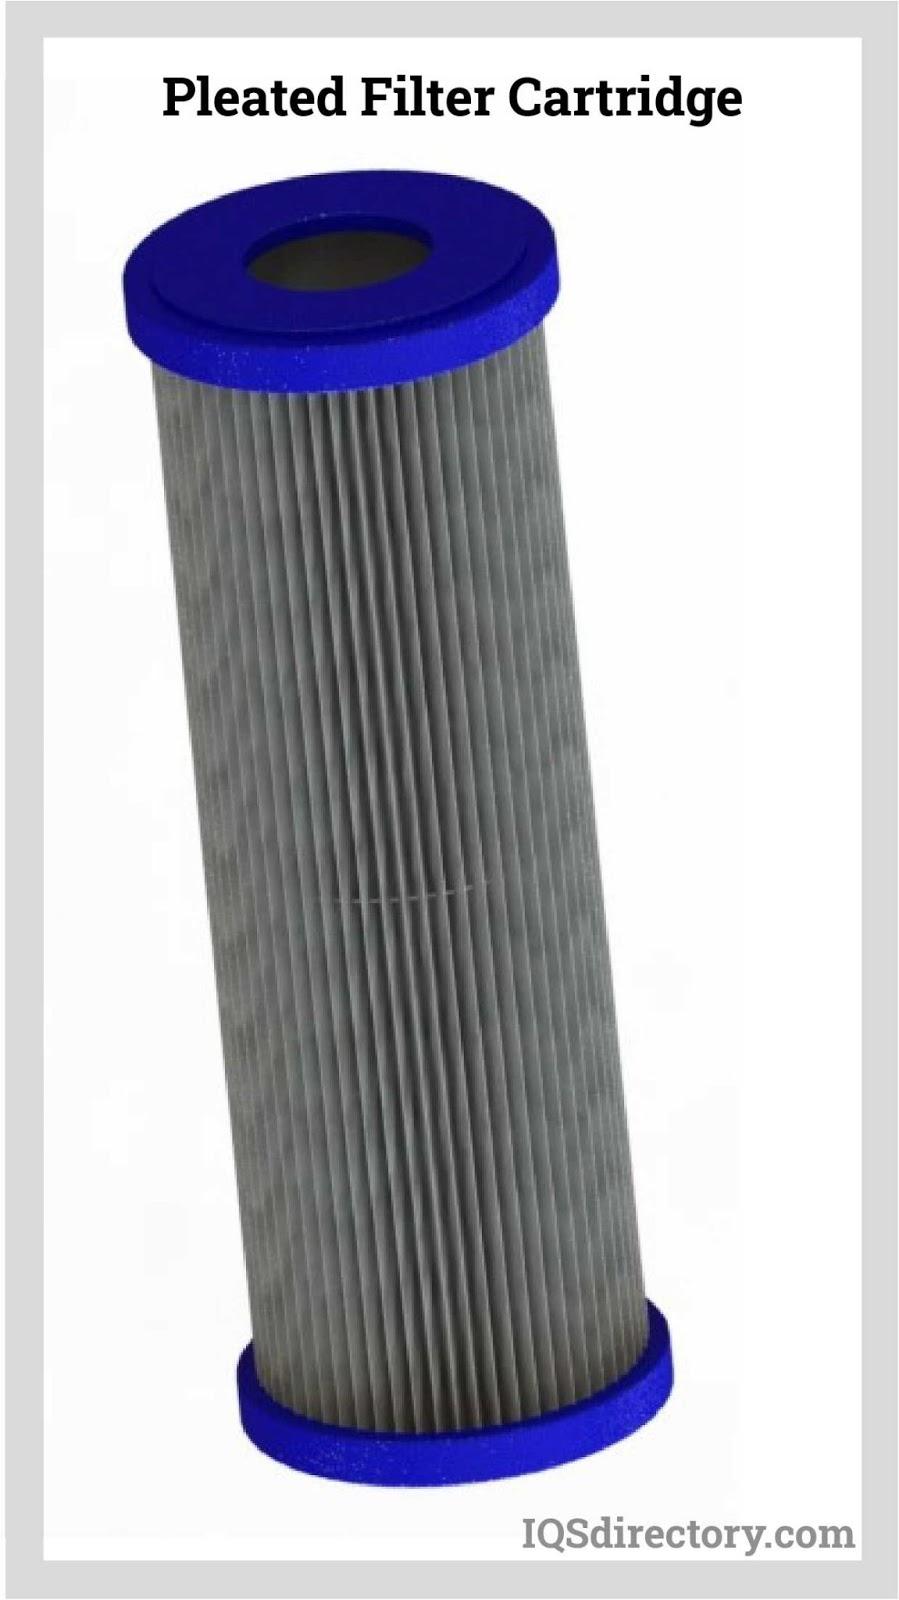 Pleated Filter Cartridge